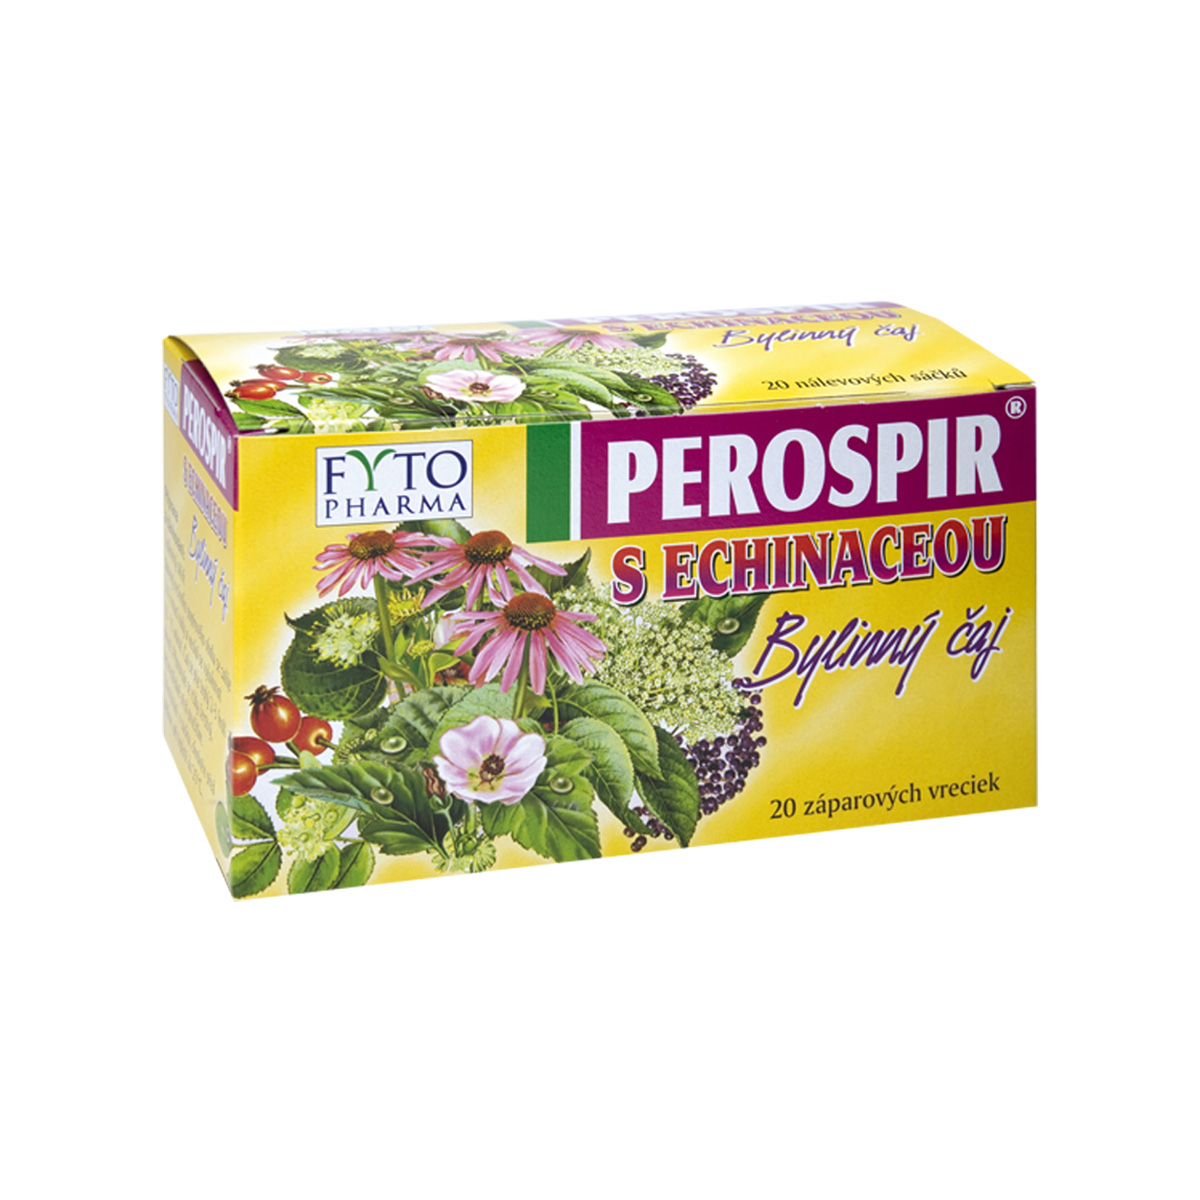 Fytopharma PEROSPIR® bylinný čaj s echinaceou 20 x 1,5 g